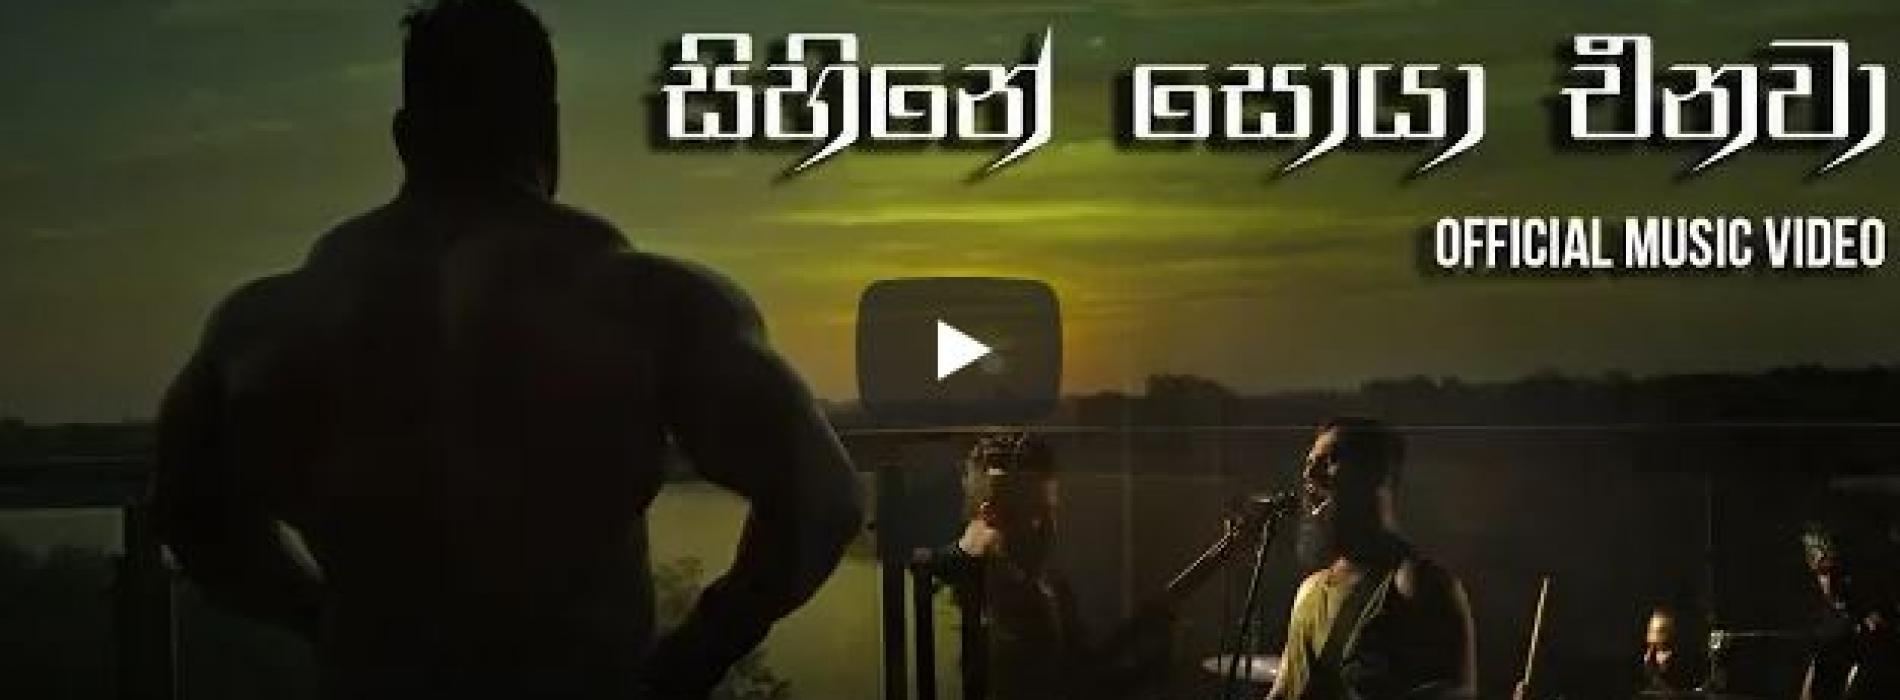 Mihindu Ariyaratne – Sihine Soya Enawa [Official Music Video]